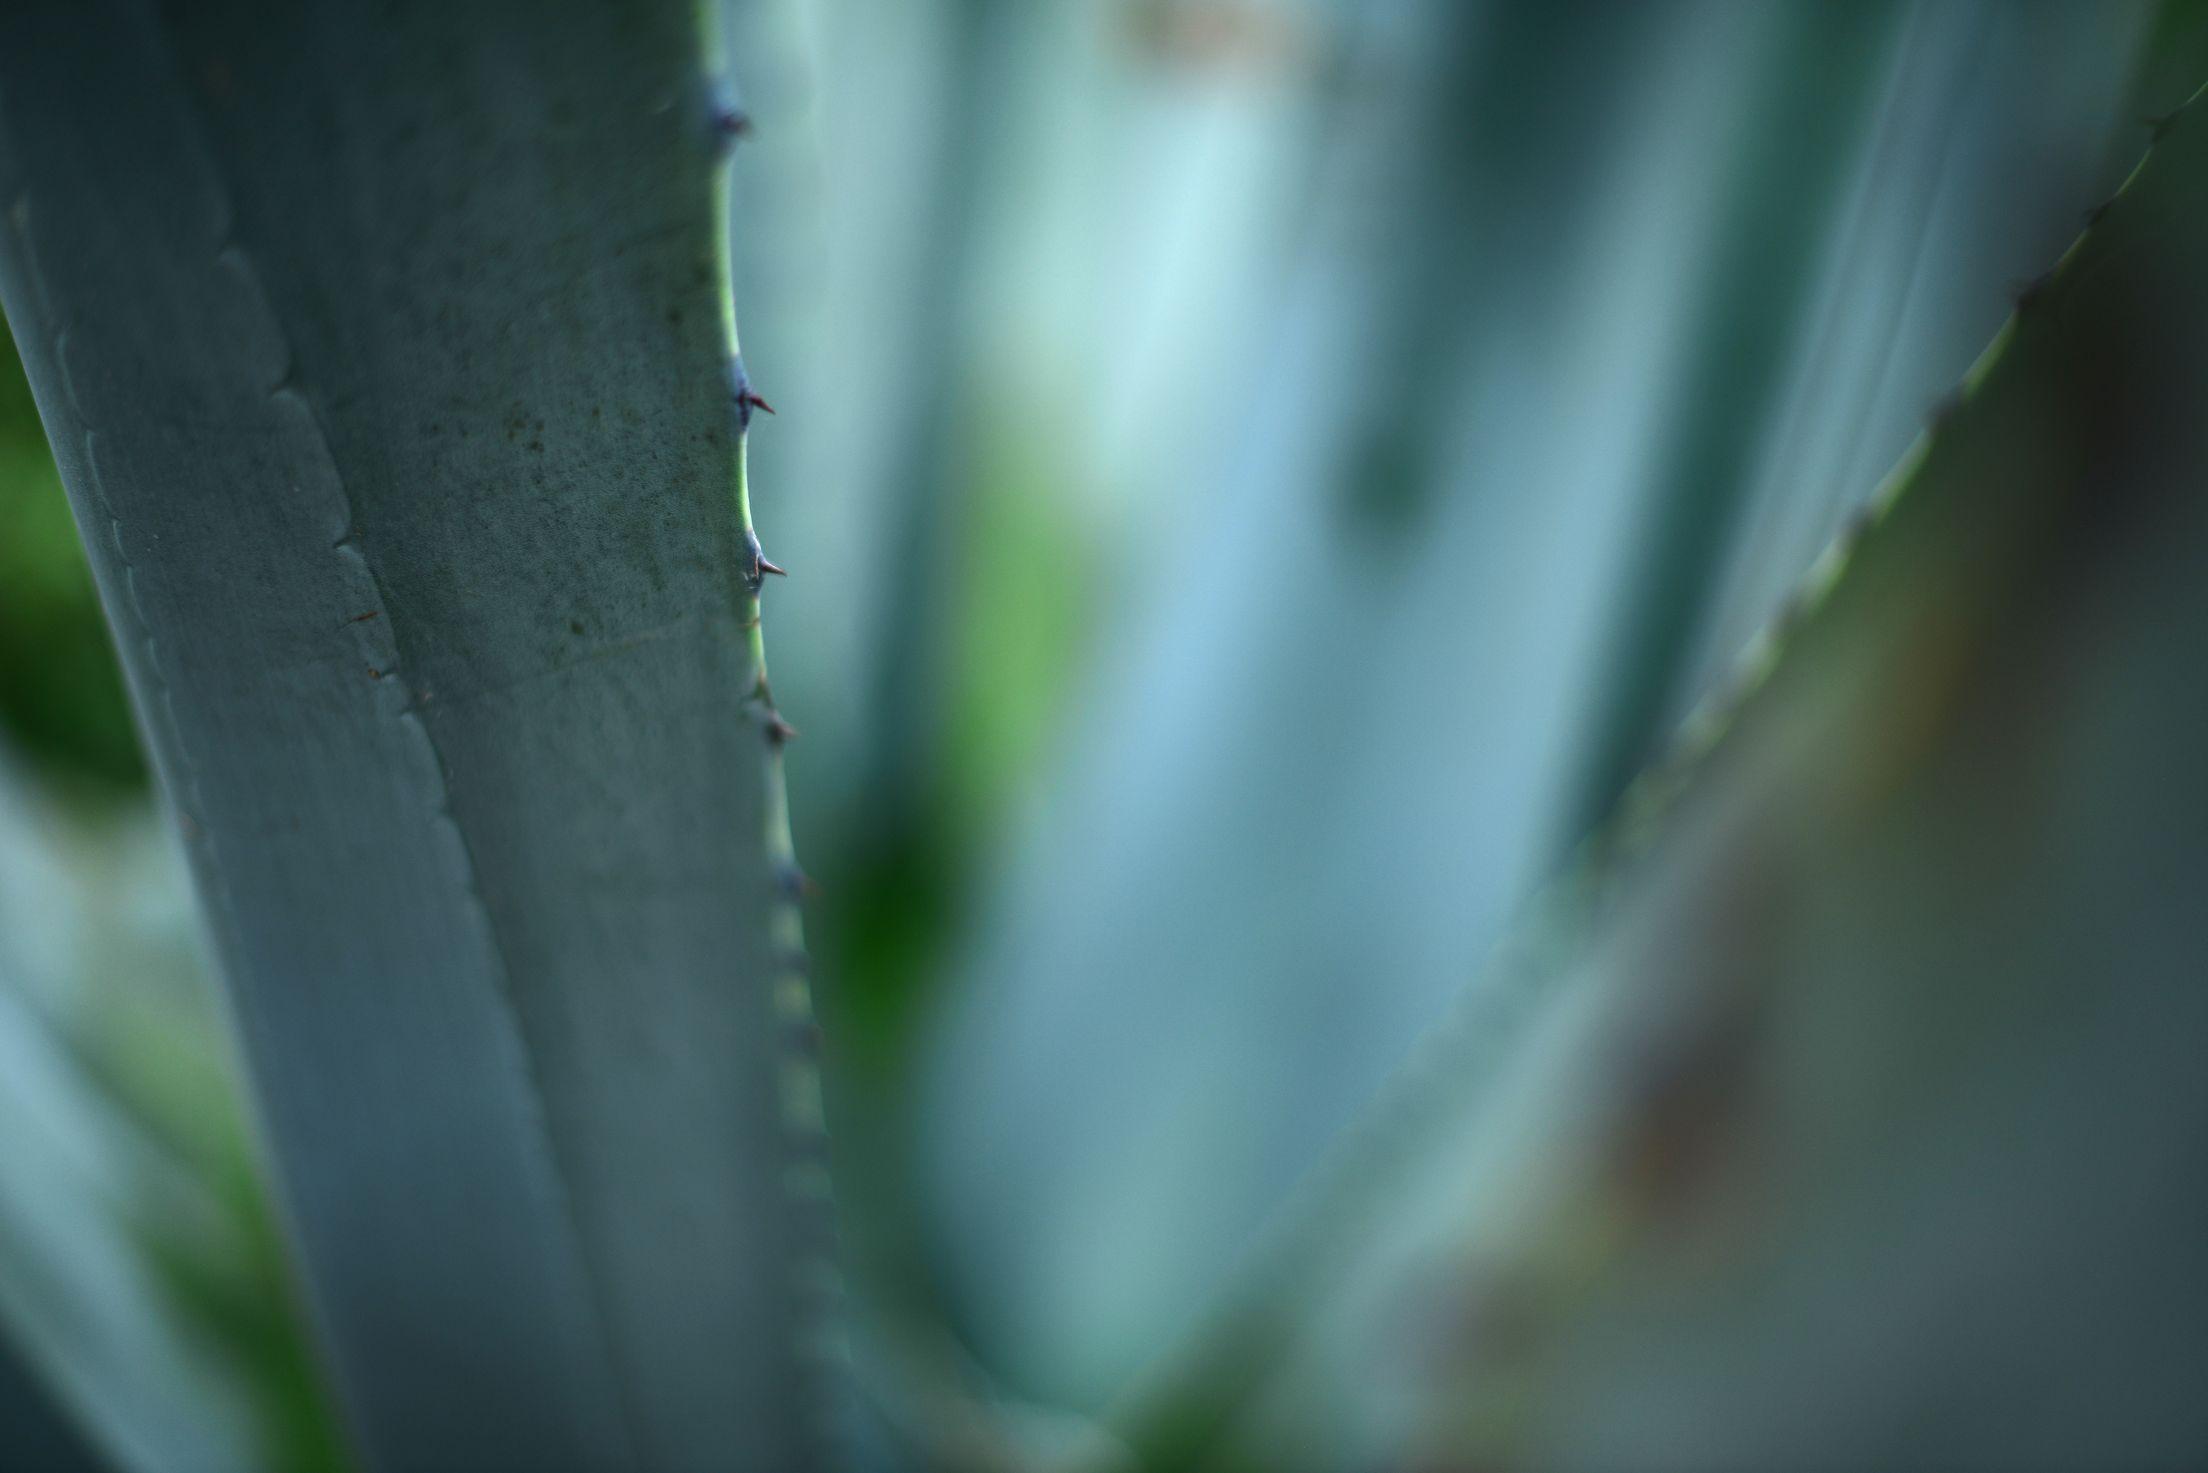 nature_2_cactus_aotearoa_1_2015-04-09 00.00.27.jpg